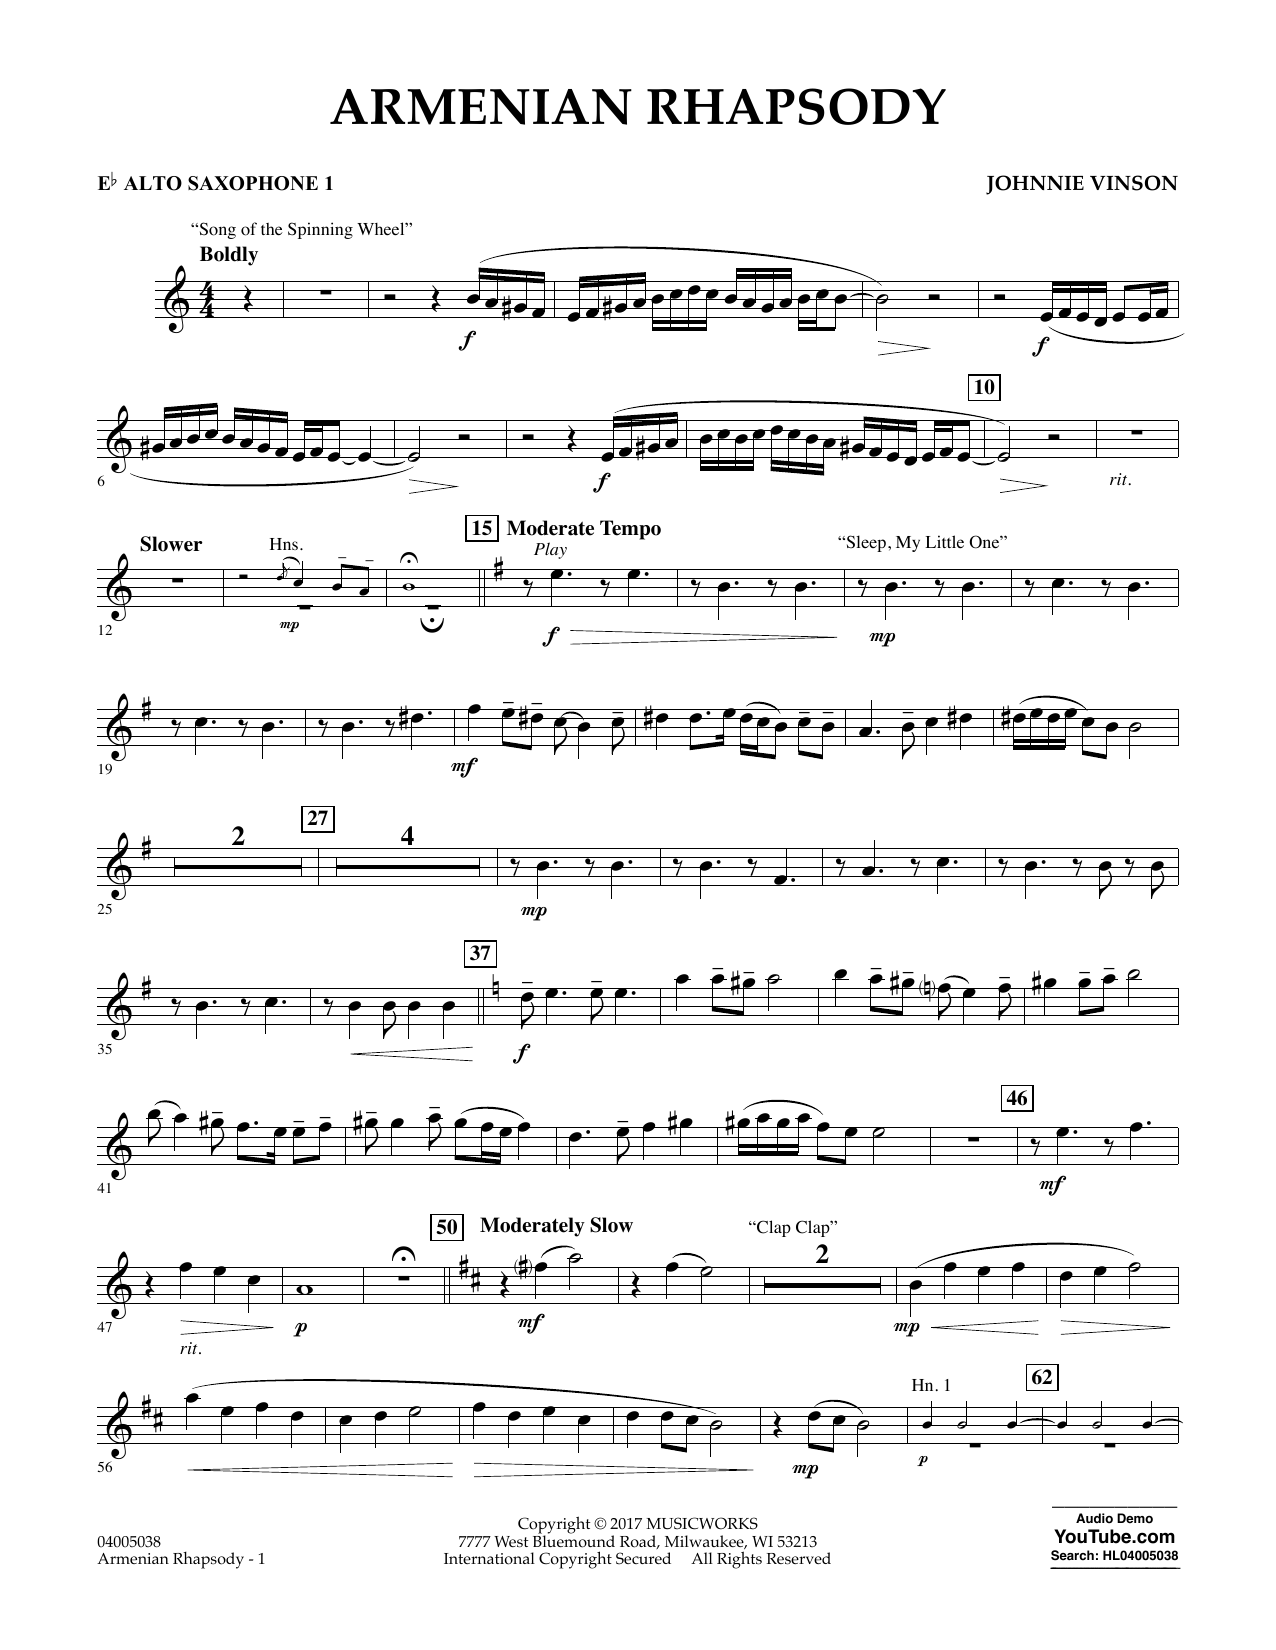 Johnnie Vinson Armenian Rhapsody - Eb Alto Saxophone 1 sheet music notes and chords. Download Printable PDF.